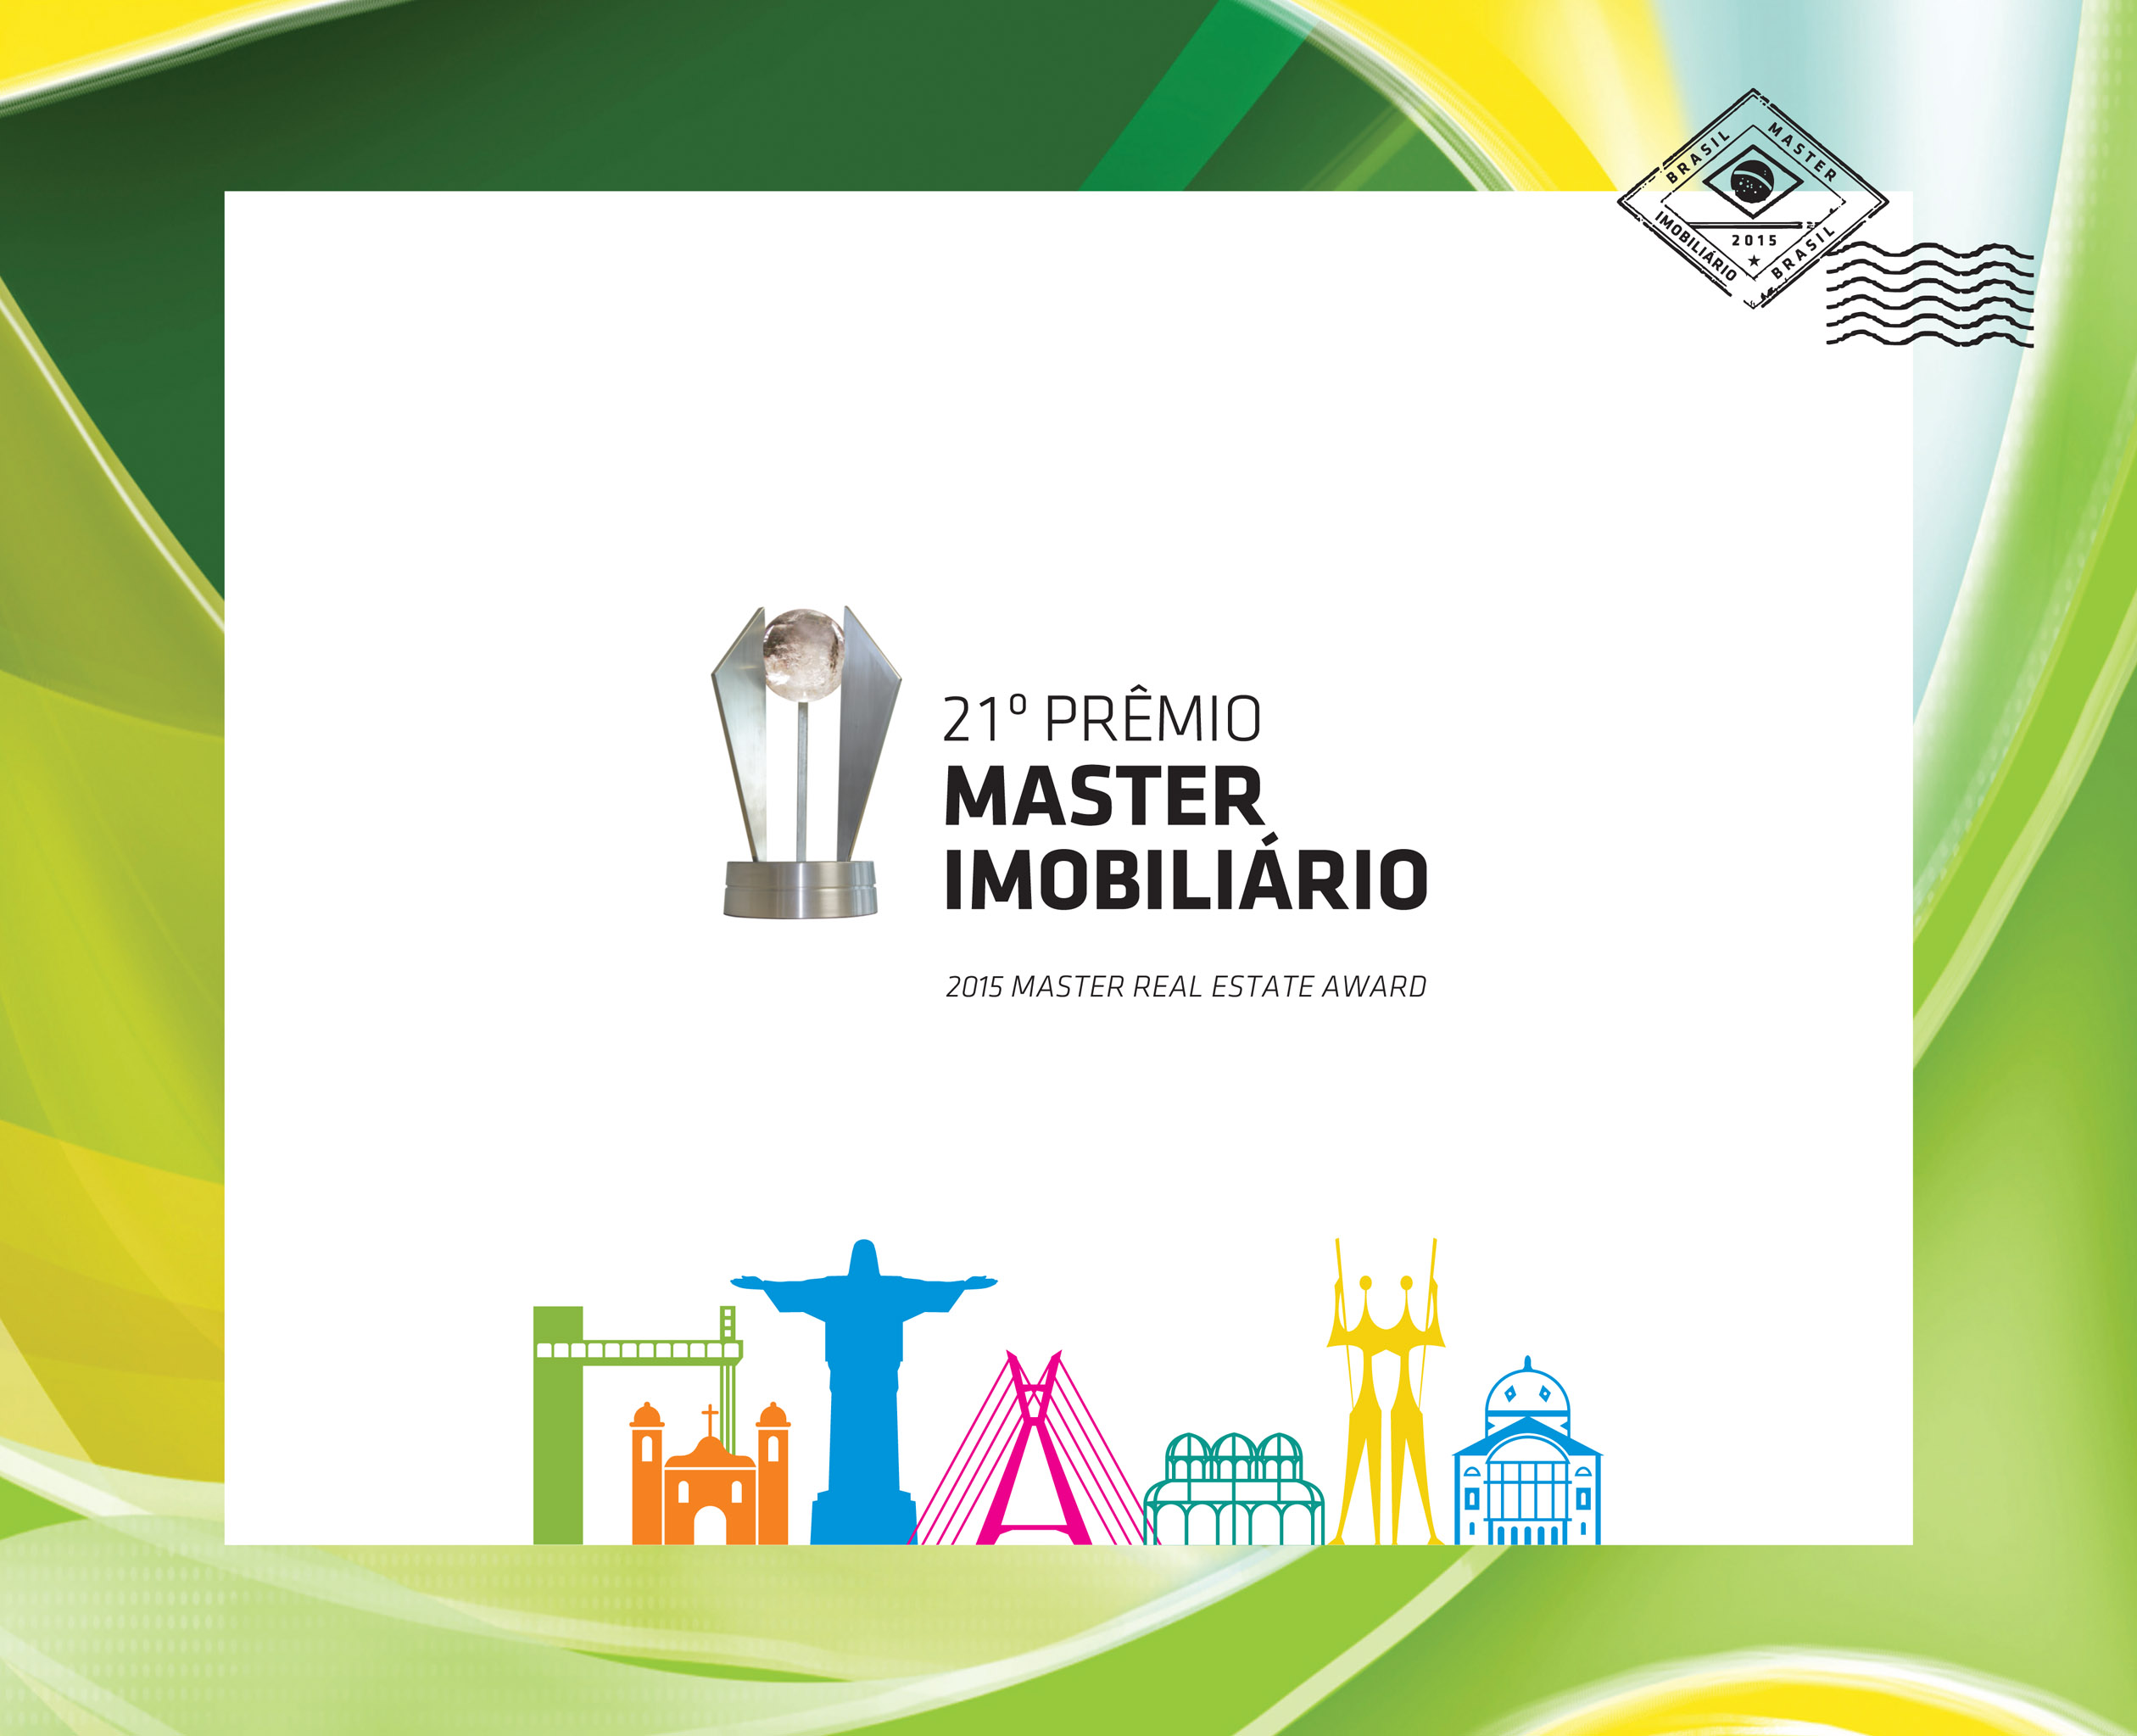 Revista - Pr�mio Master Imobili�rio 2015